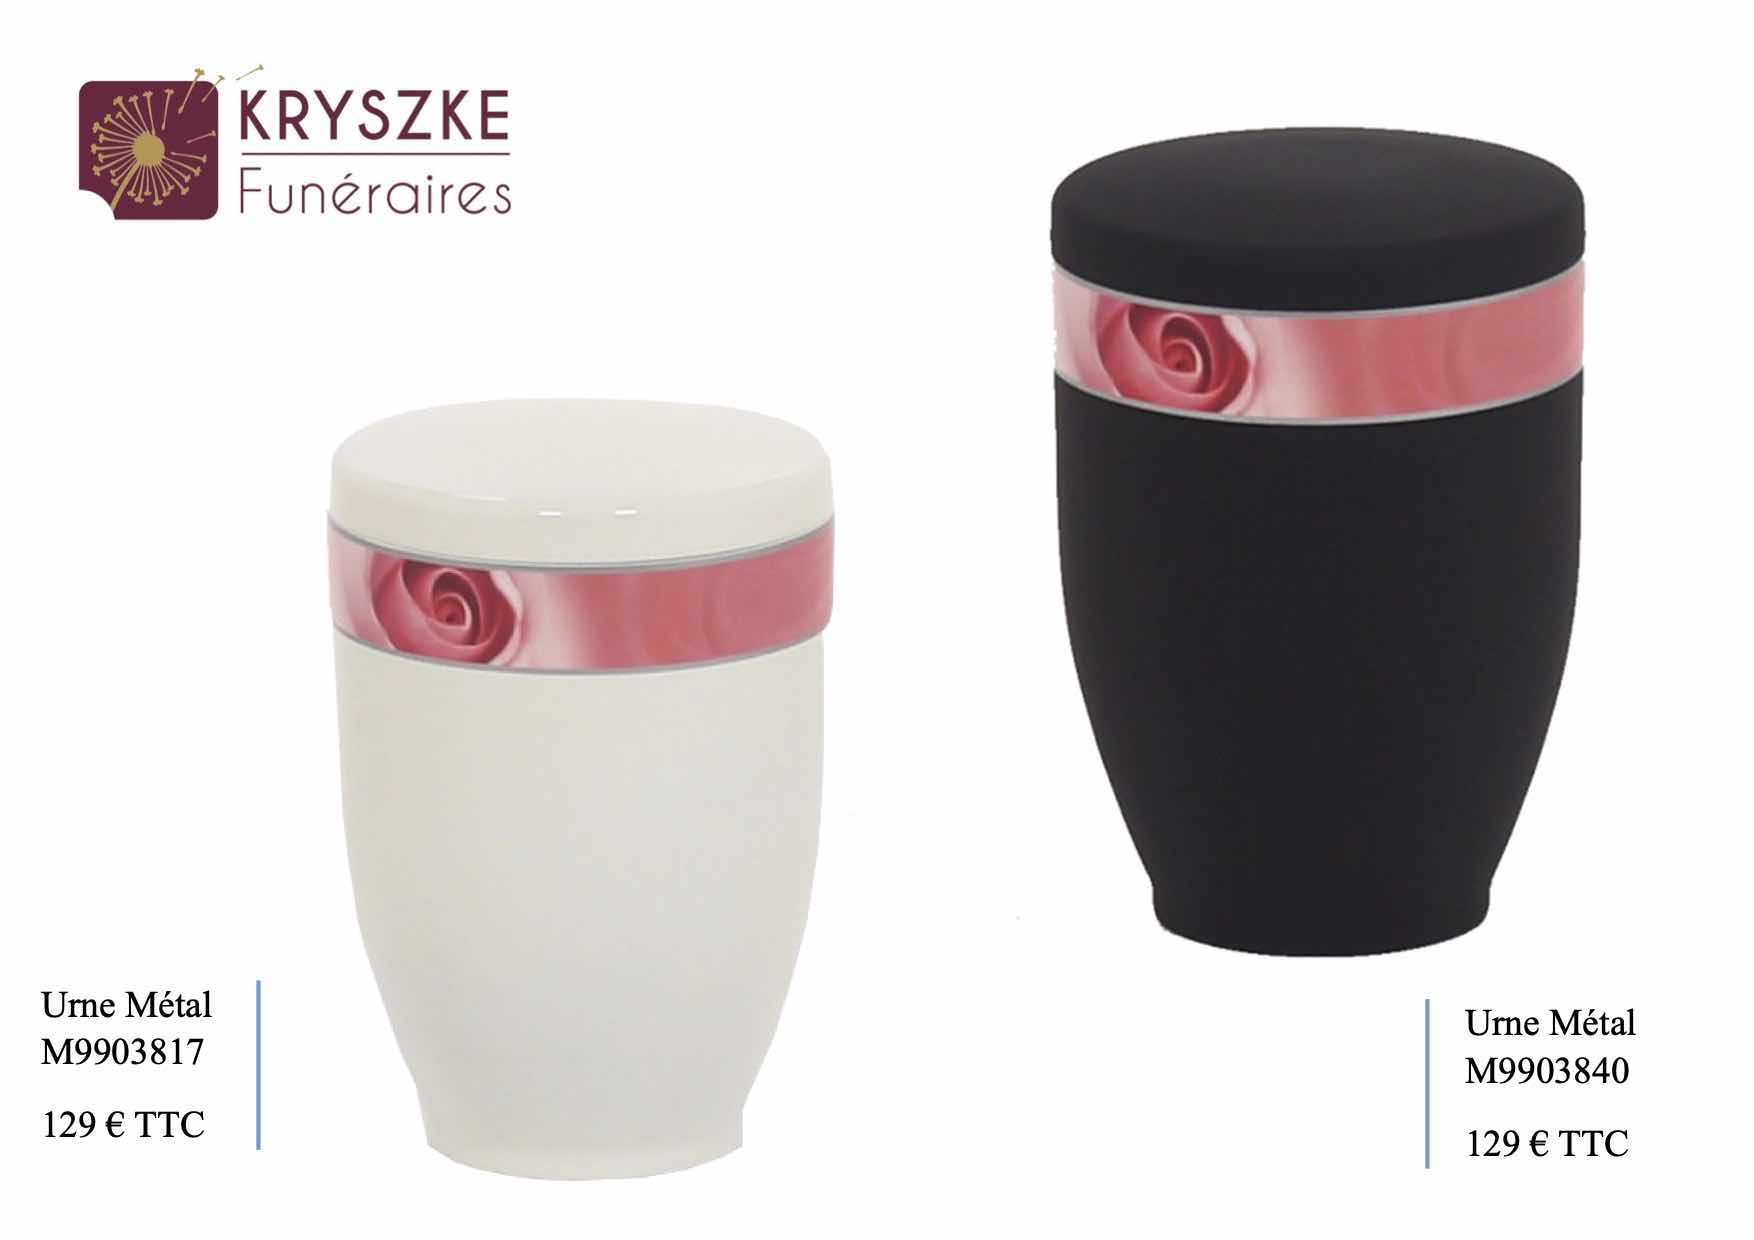 Urne métal à motif rose